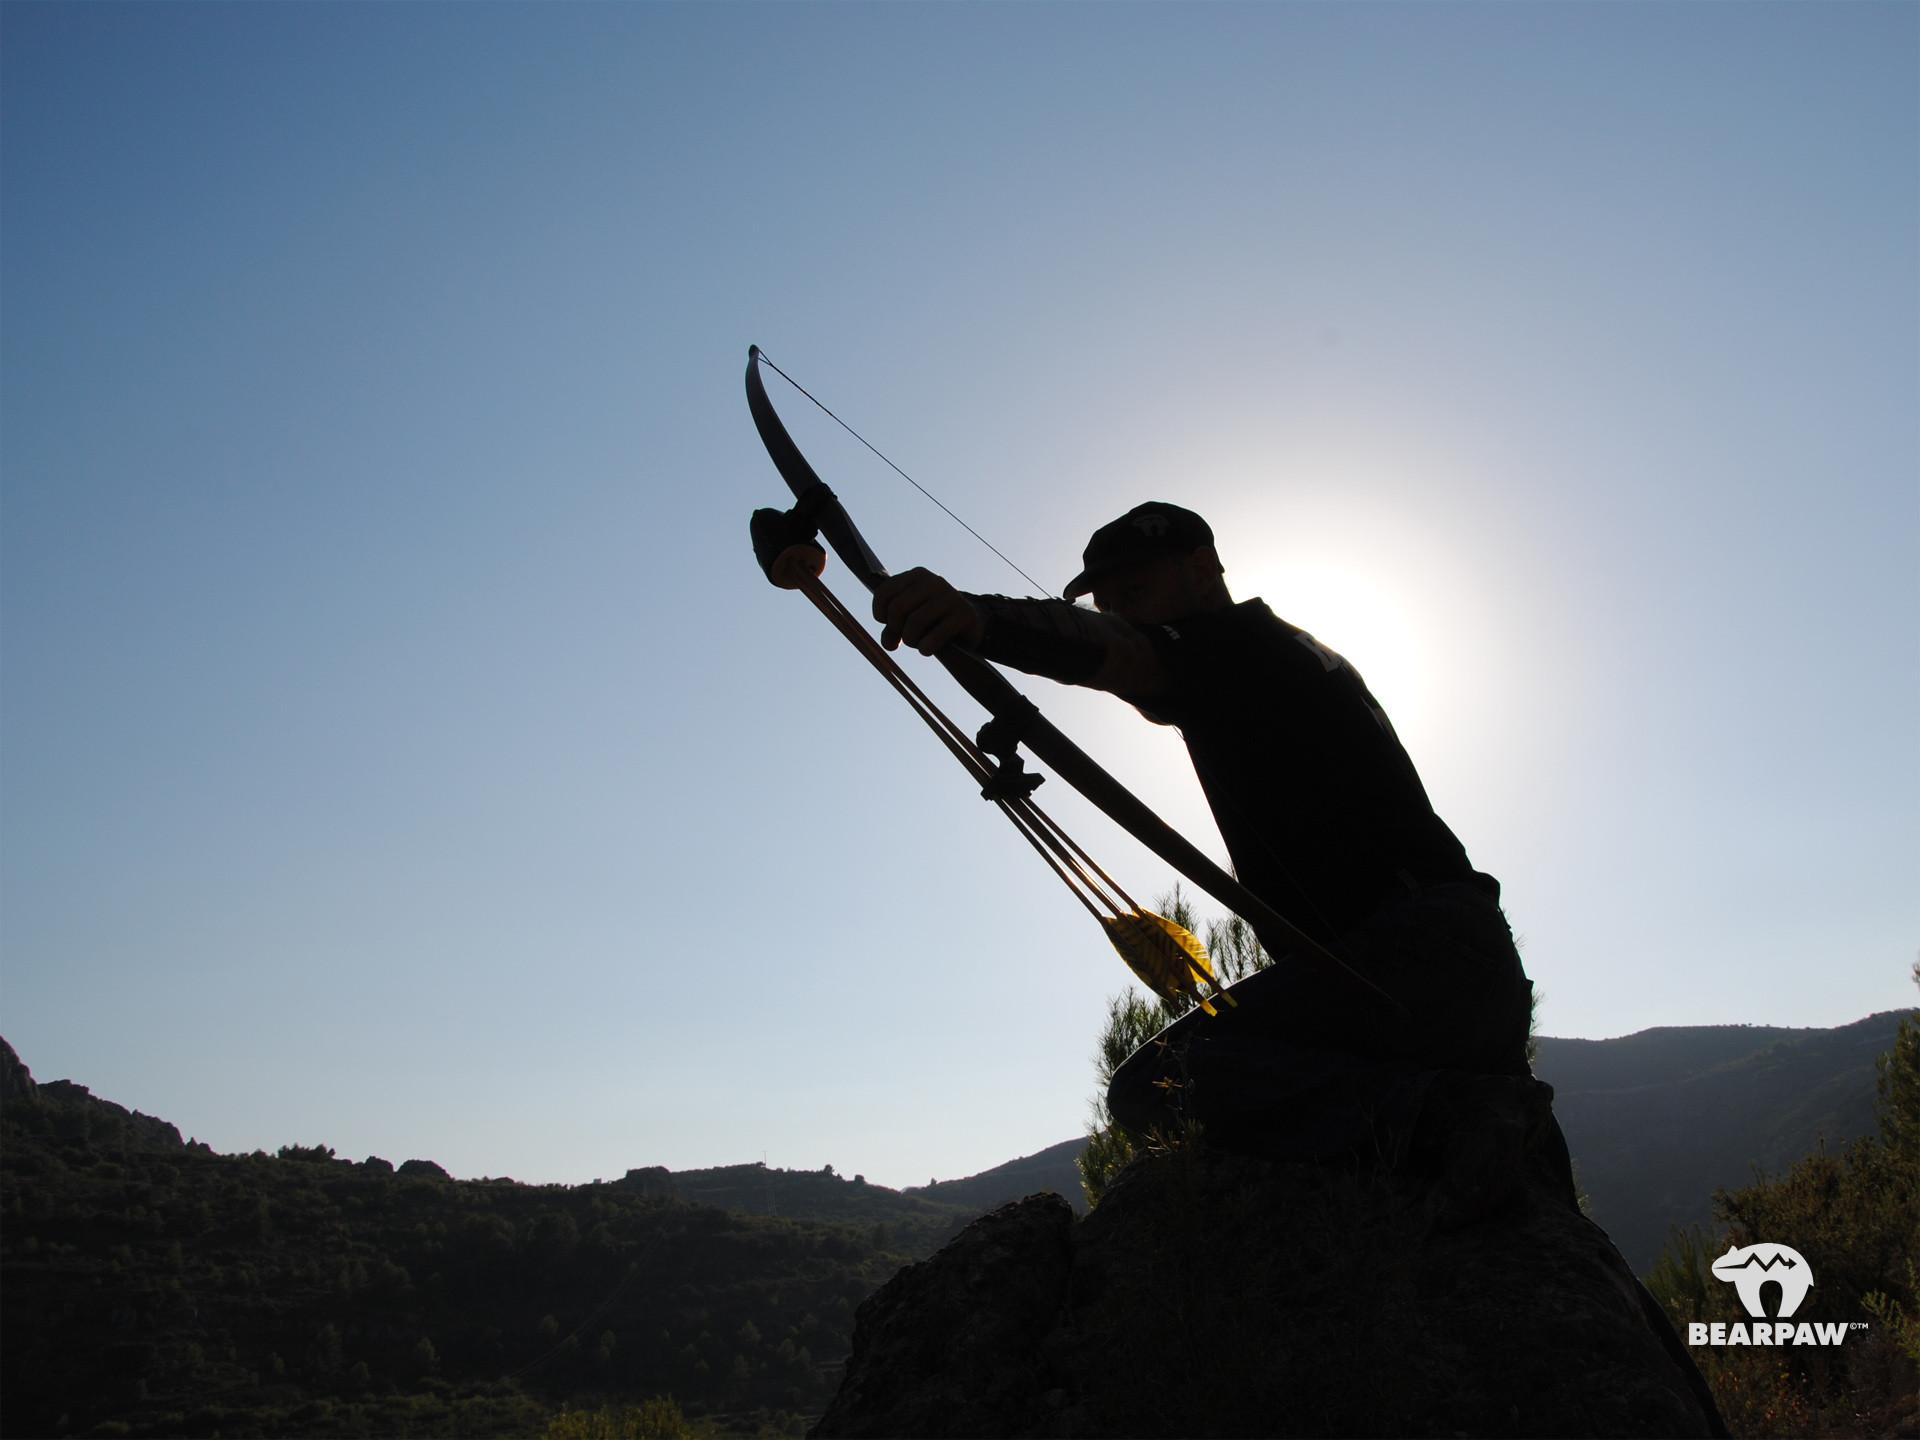 Res: 1920x1440, Archery Wallpaper Photo #aKY